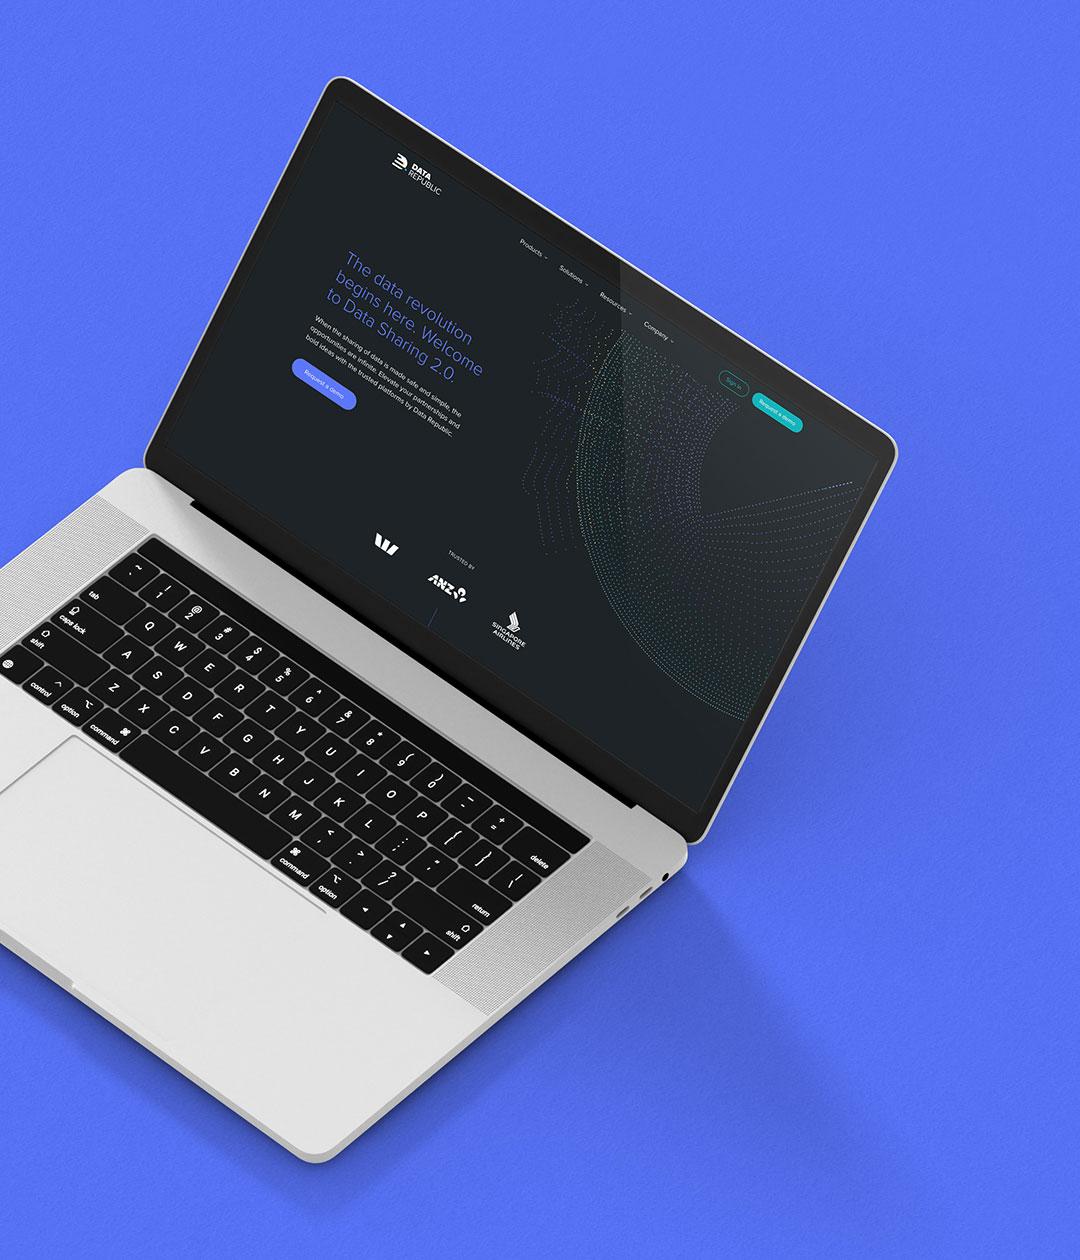 https://theory.agency/wp-content/uploads/2020/03/data-repblic-website-design.jpg